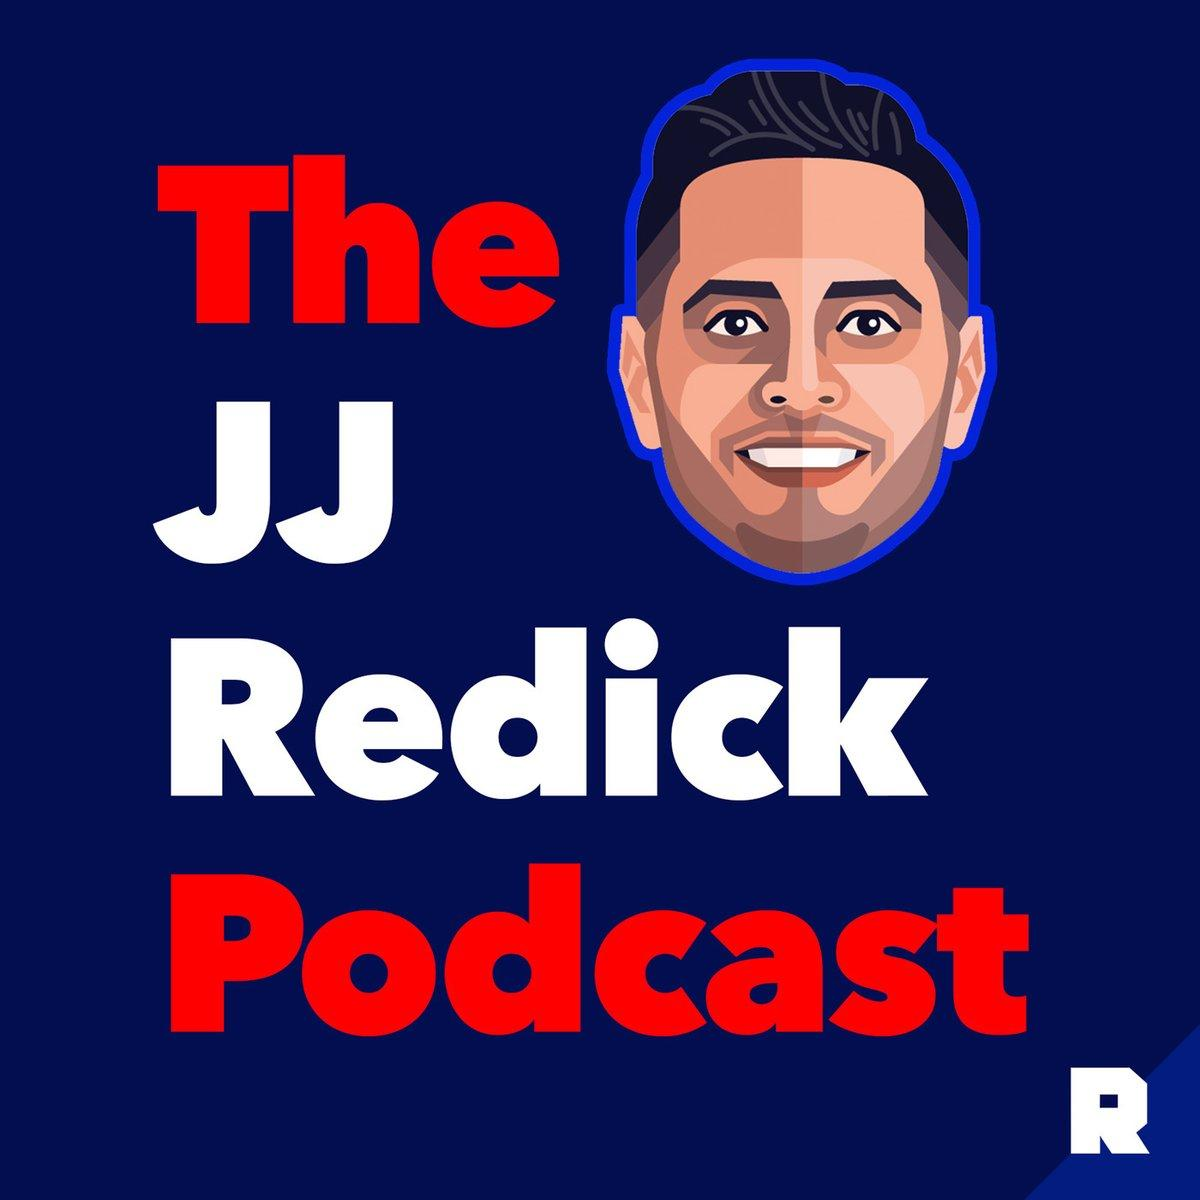 @JJRedick   Andre Iguodala on His New Memoir, the NCAA, and the Hall of Fame   @andre #DubNation #NCAABasketball #HOF  #JJRedickPod #NBA #NBATwitter #NBPA #NBAPodGod   Listen here 🎧: https://art19.com/shows/the-jj-redick-podcast…